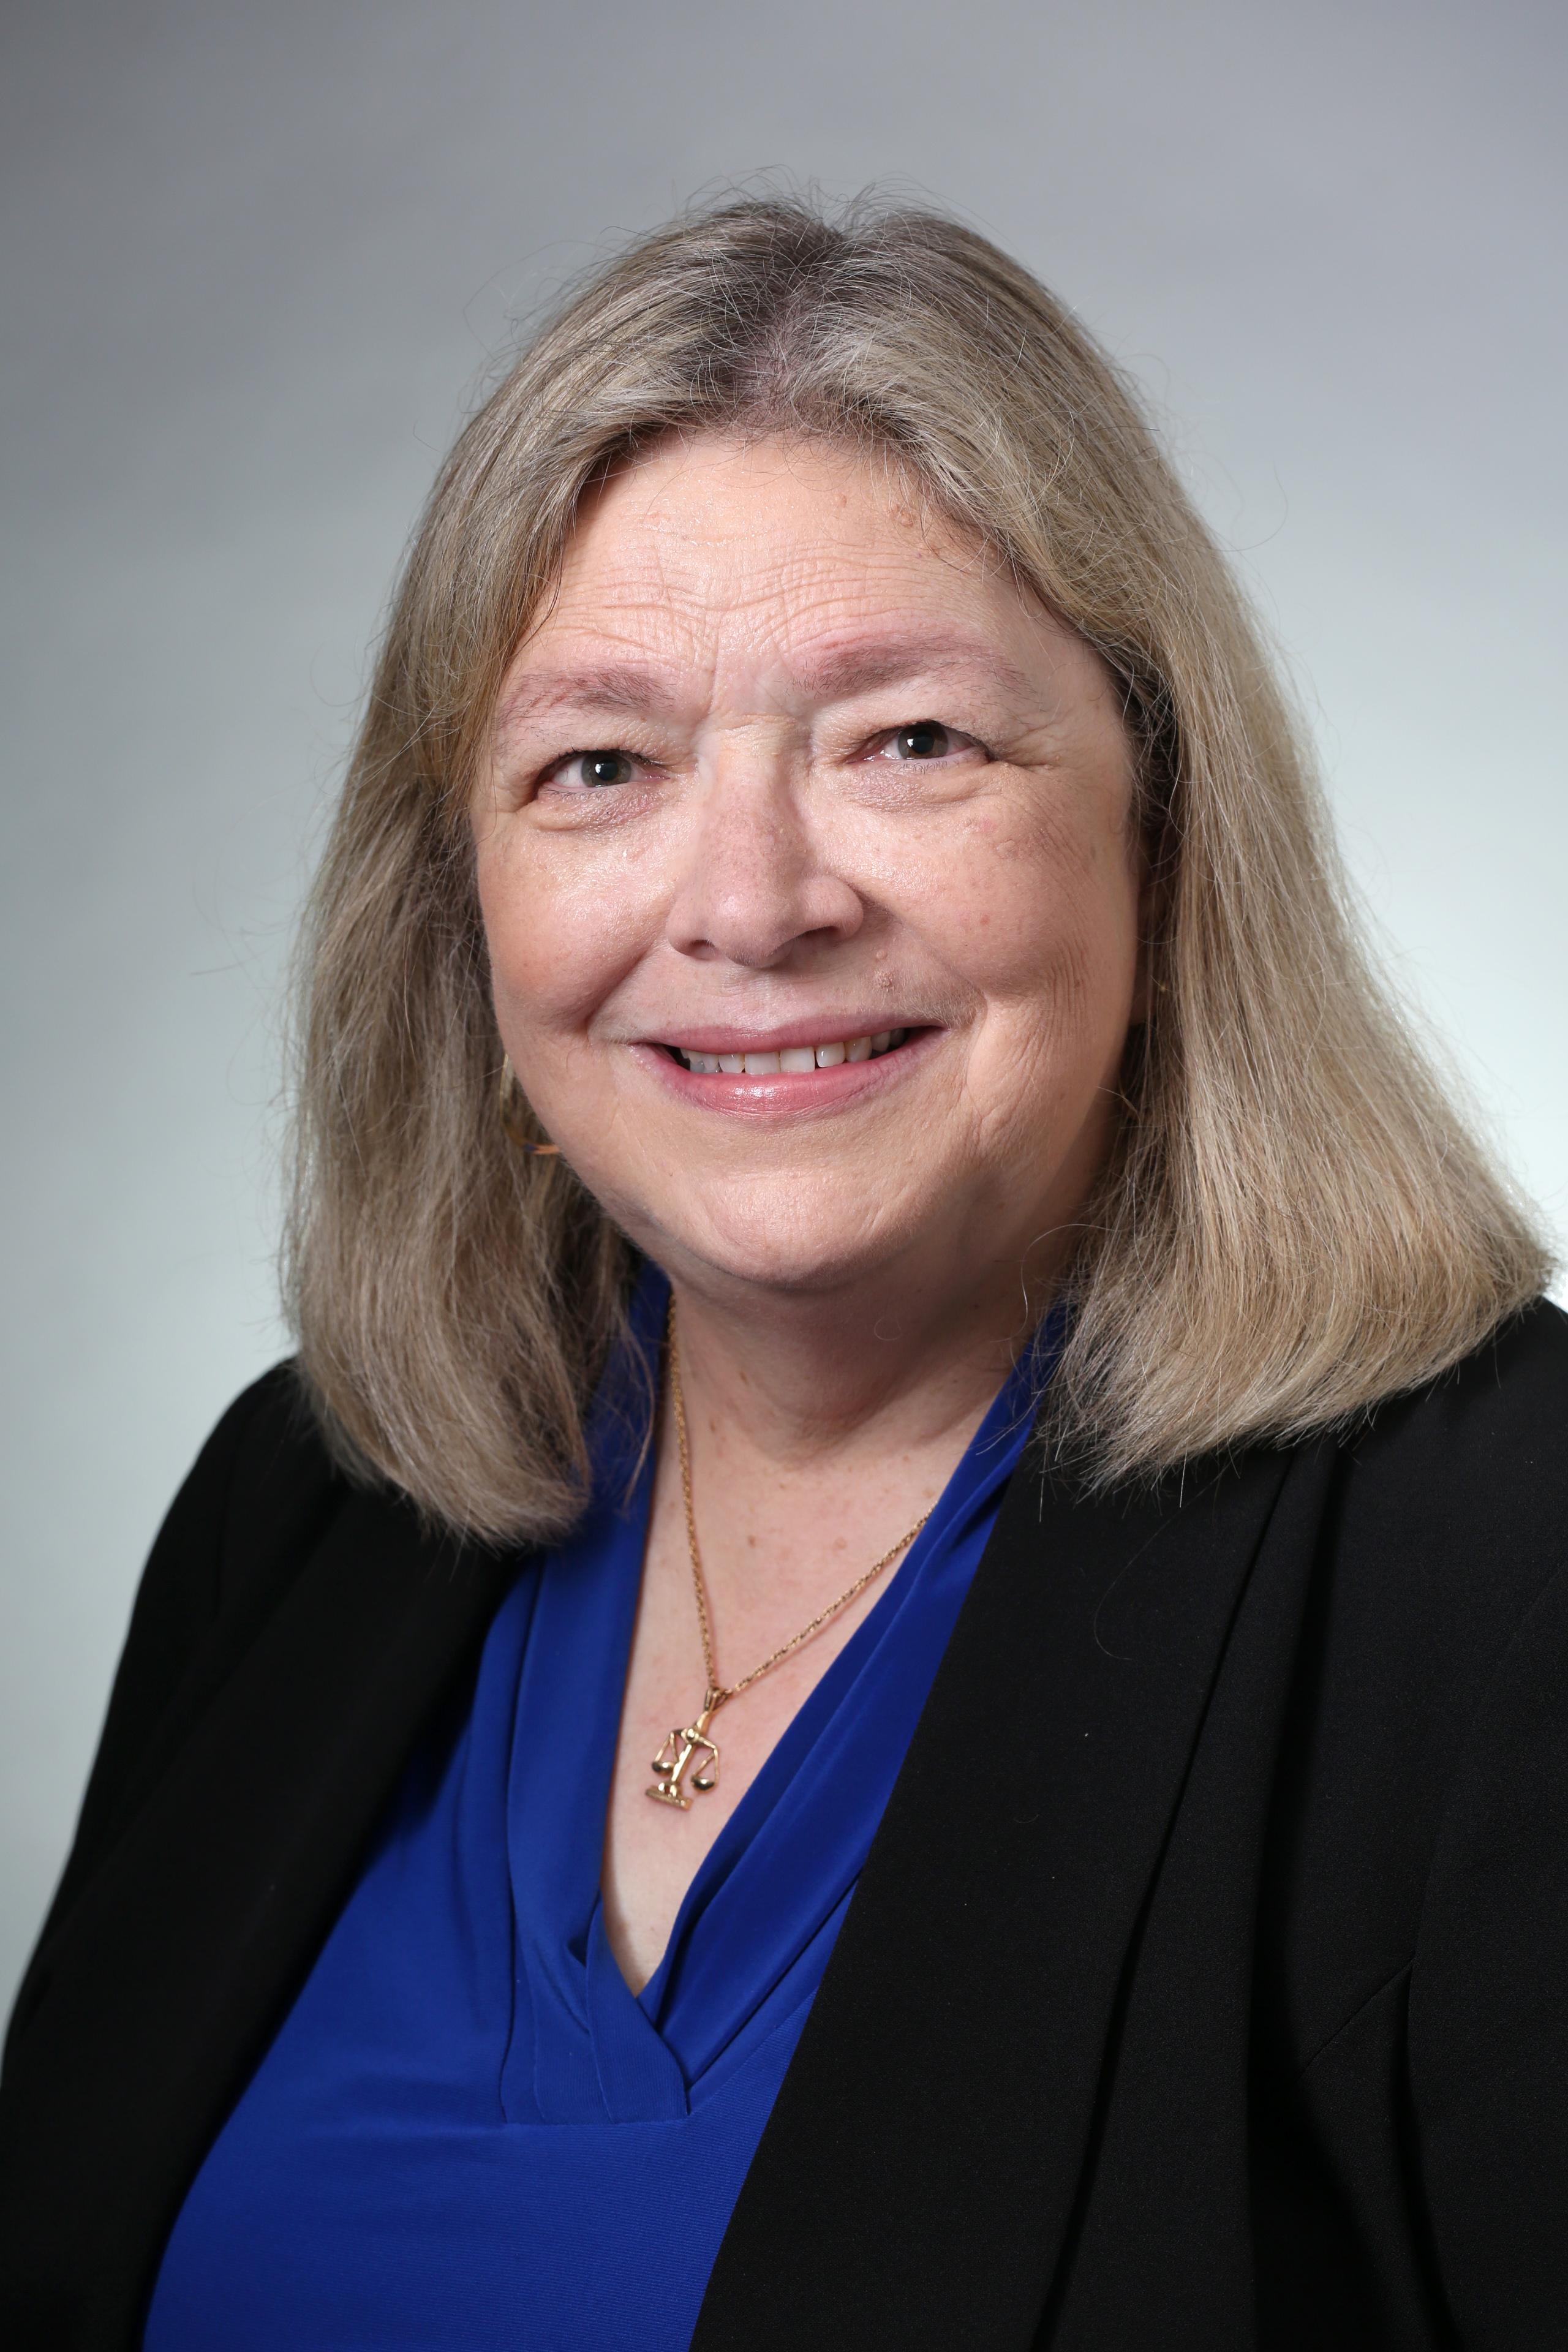 Hon. Bonnie H. MacLeod (ret.)